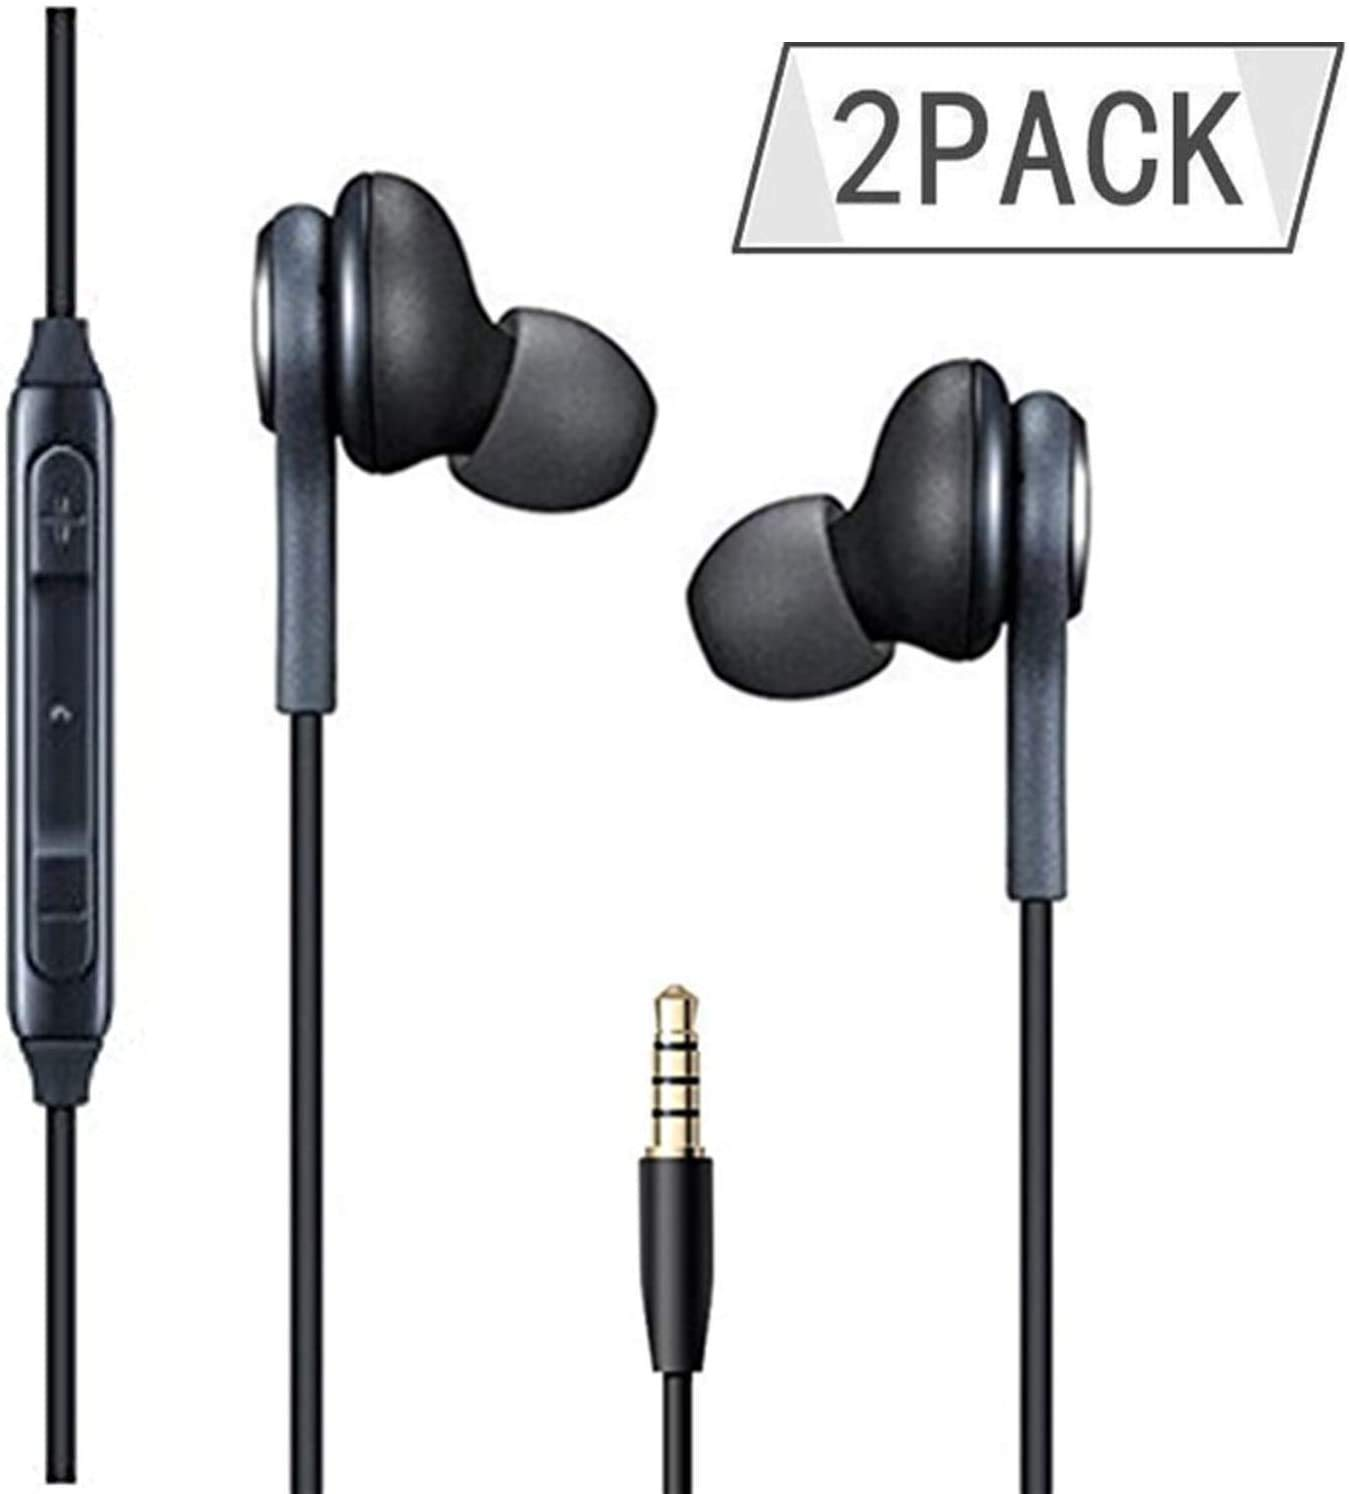 PopKoko Headphones/Earphones/Earbuds,3.5mm aux Wired Headphones Noise Isolating Earphones Built-in Microphone & Volume Control Compatible Galaxy iPhone iPod iPad Android/MP3 MP4 (2PACK)(Black)